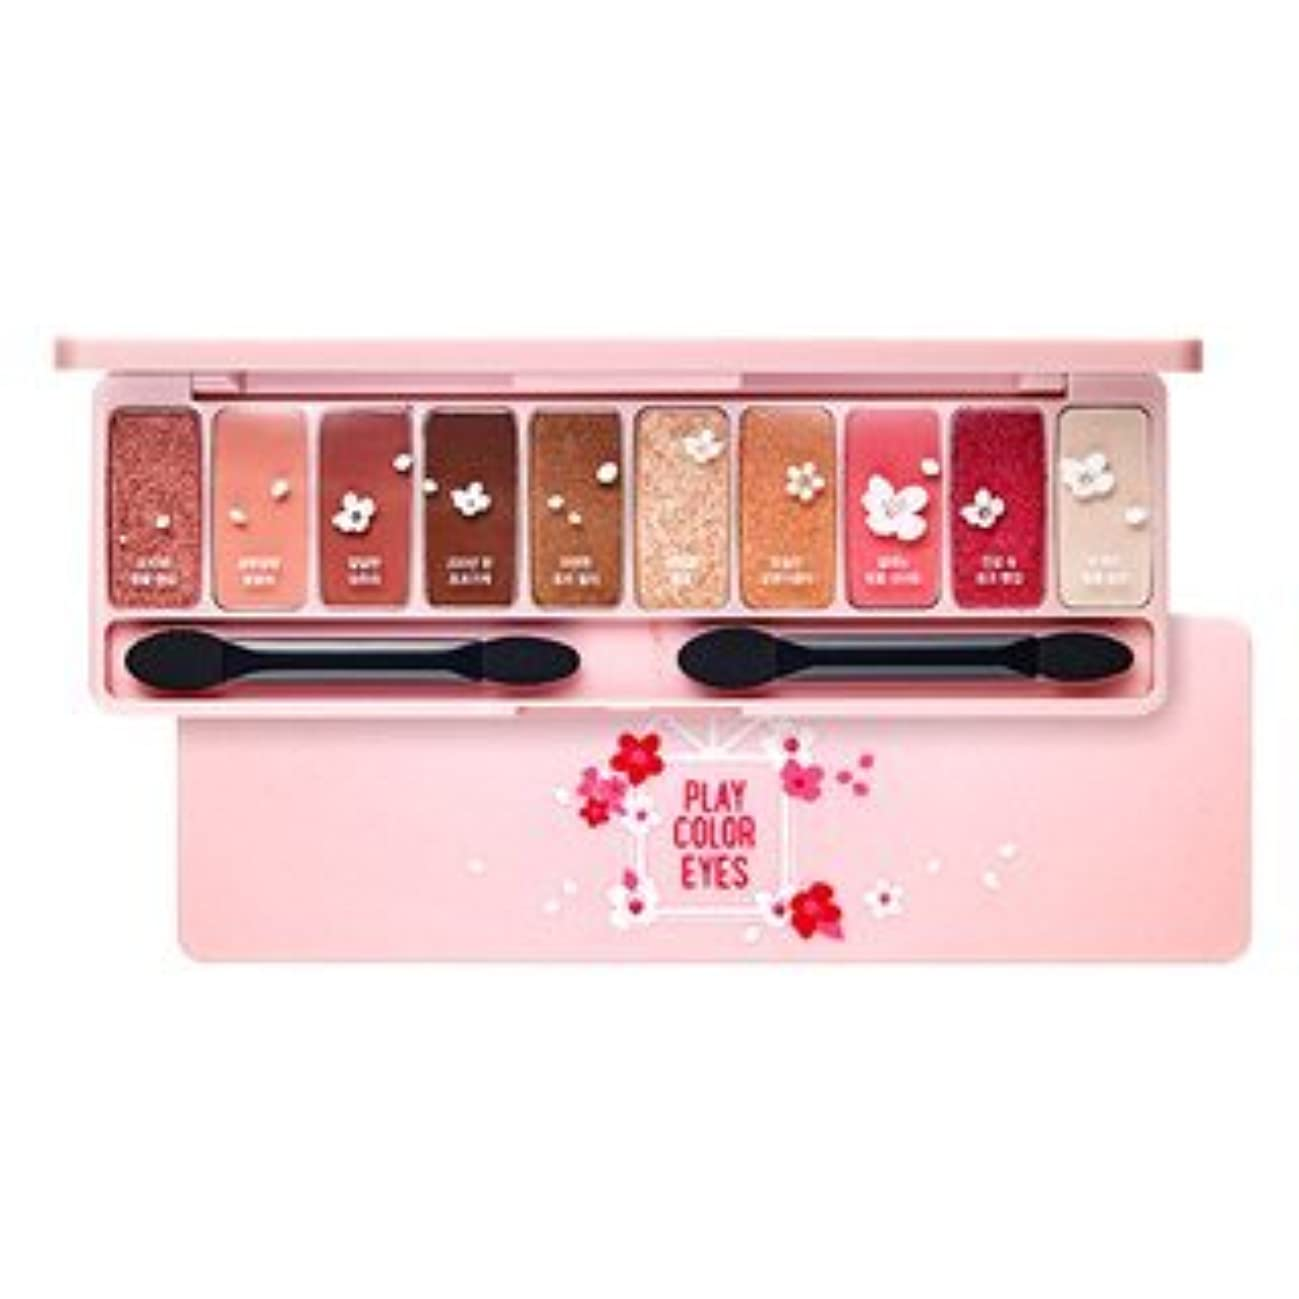 ETUDE HOUSE Play Color Eyes Cherry Blossom / エチュードハウス プレイカラーアイズチェリーブロッサム 1g x10